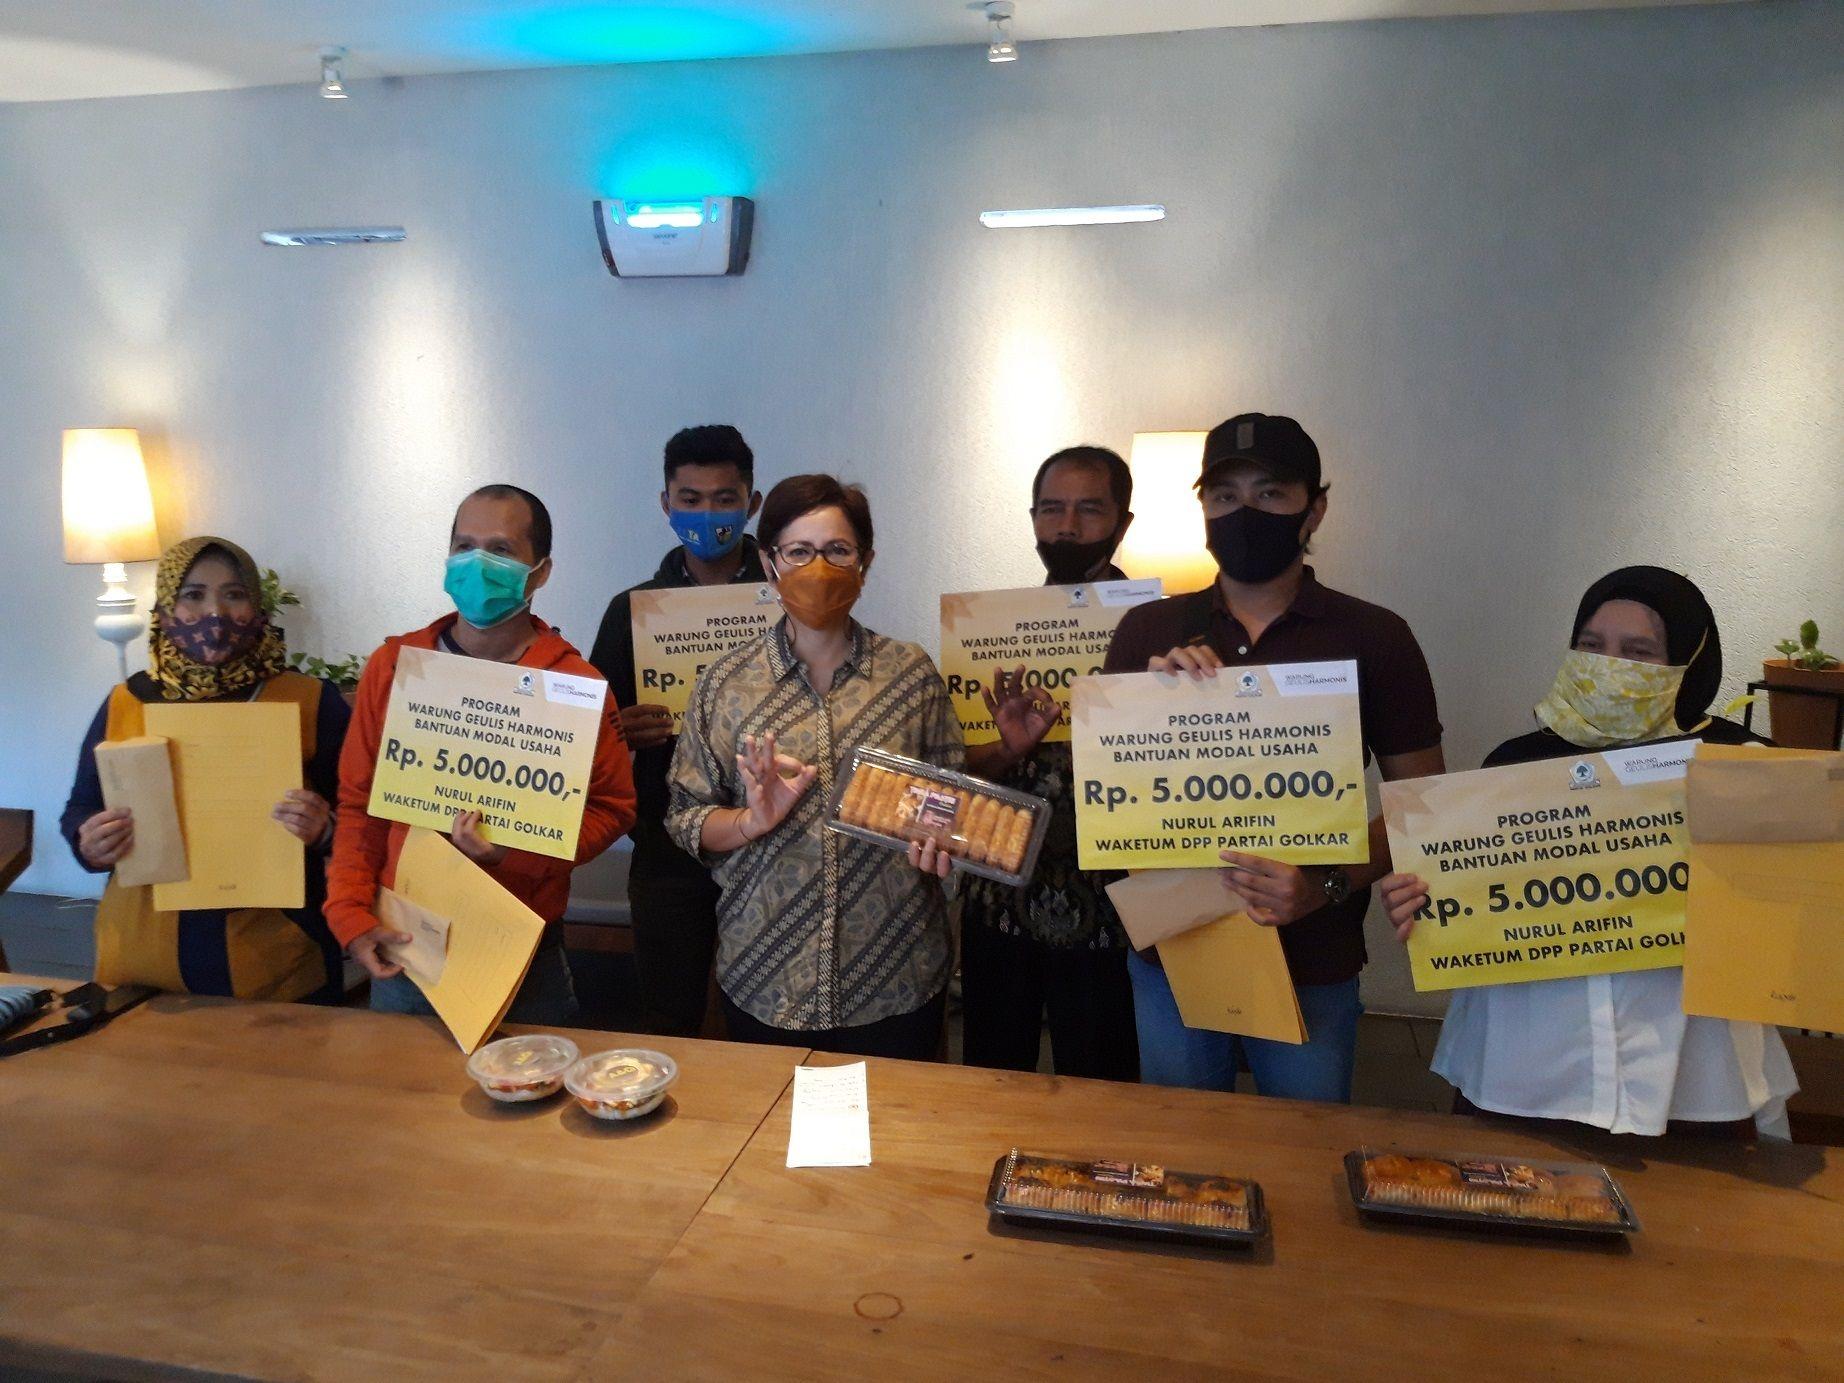 Warung Geulis Harmonis, Cara Nurul Arifin Gerakkan UMKM dan Ekonomi Masyarakat Bandung